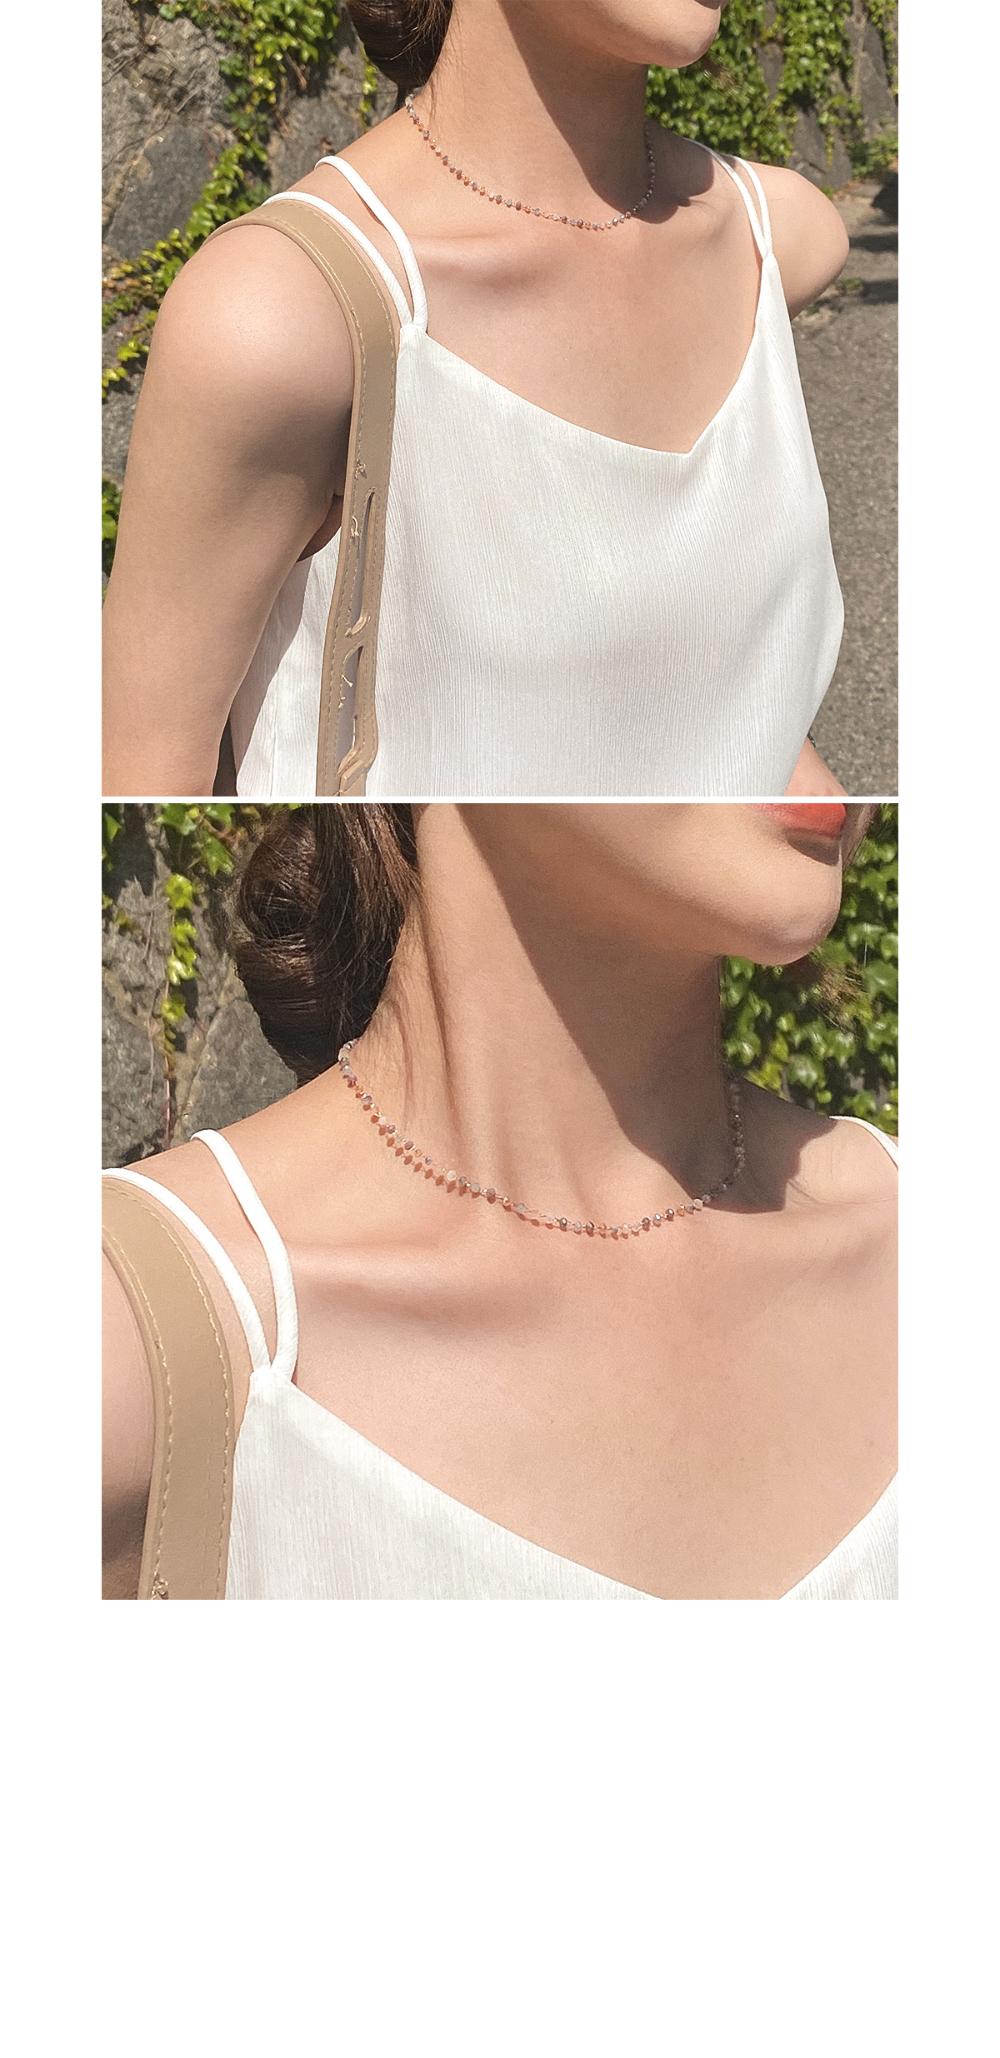 jack crystal necklace